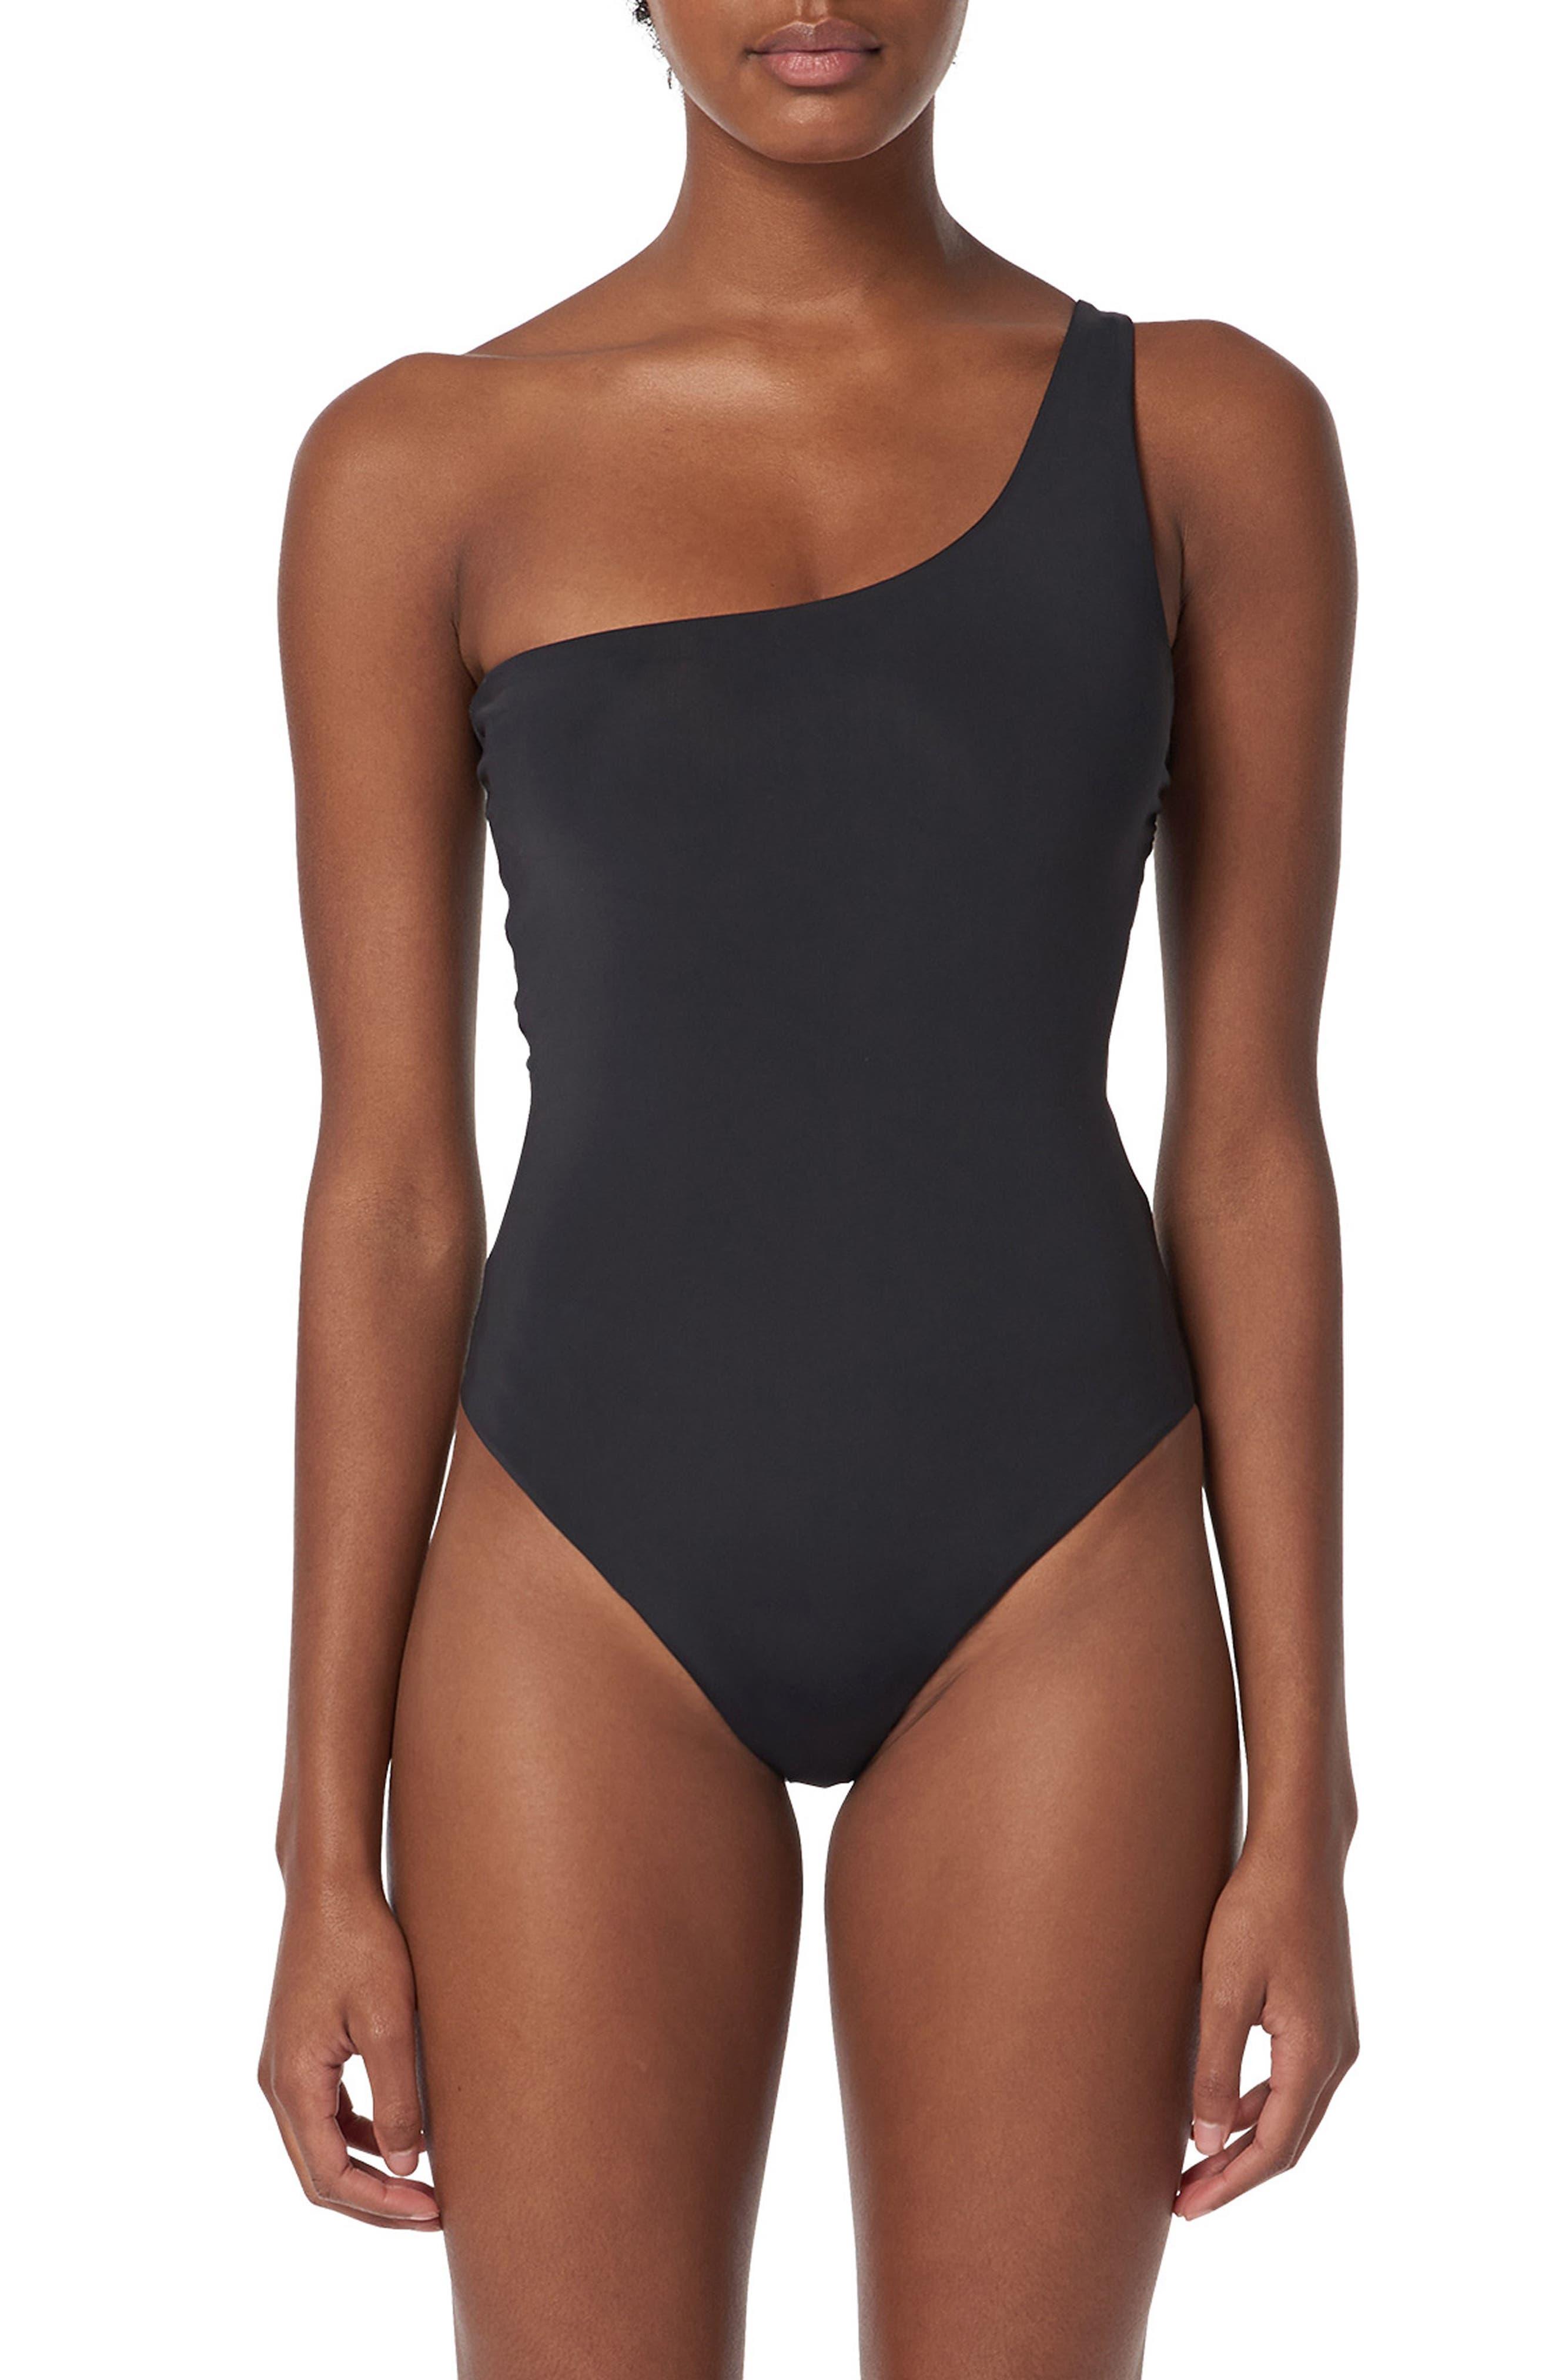 Alternate Image 1 Selected - Mara Hoffman Cher One-Piece Swimsuit